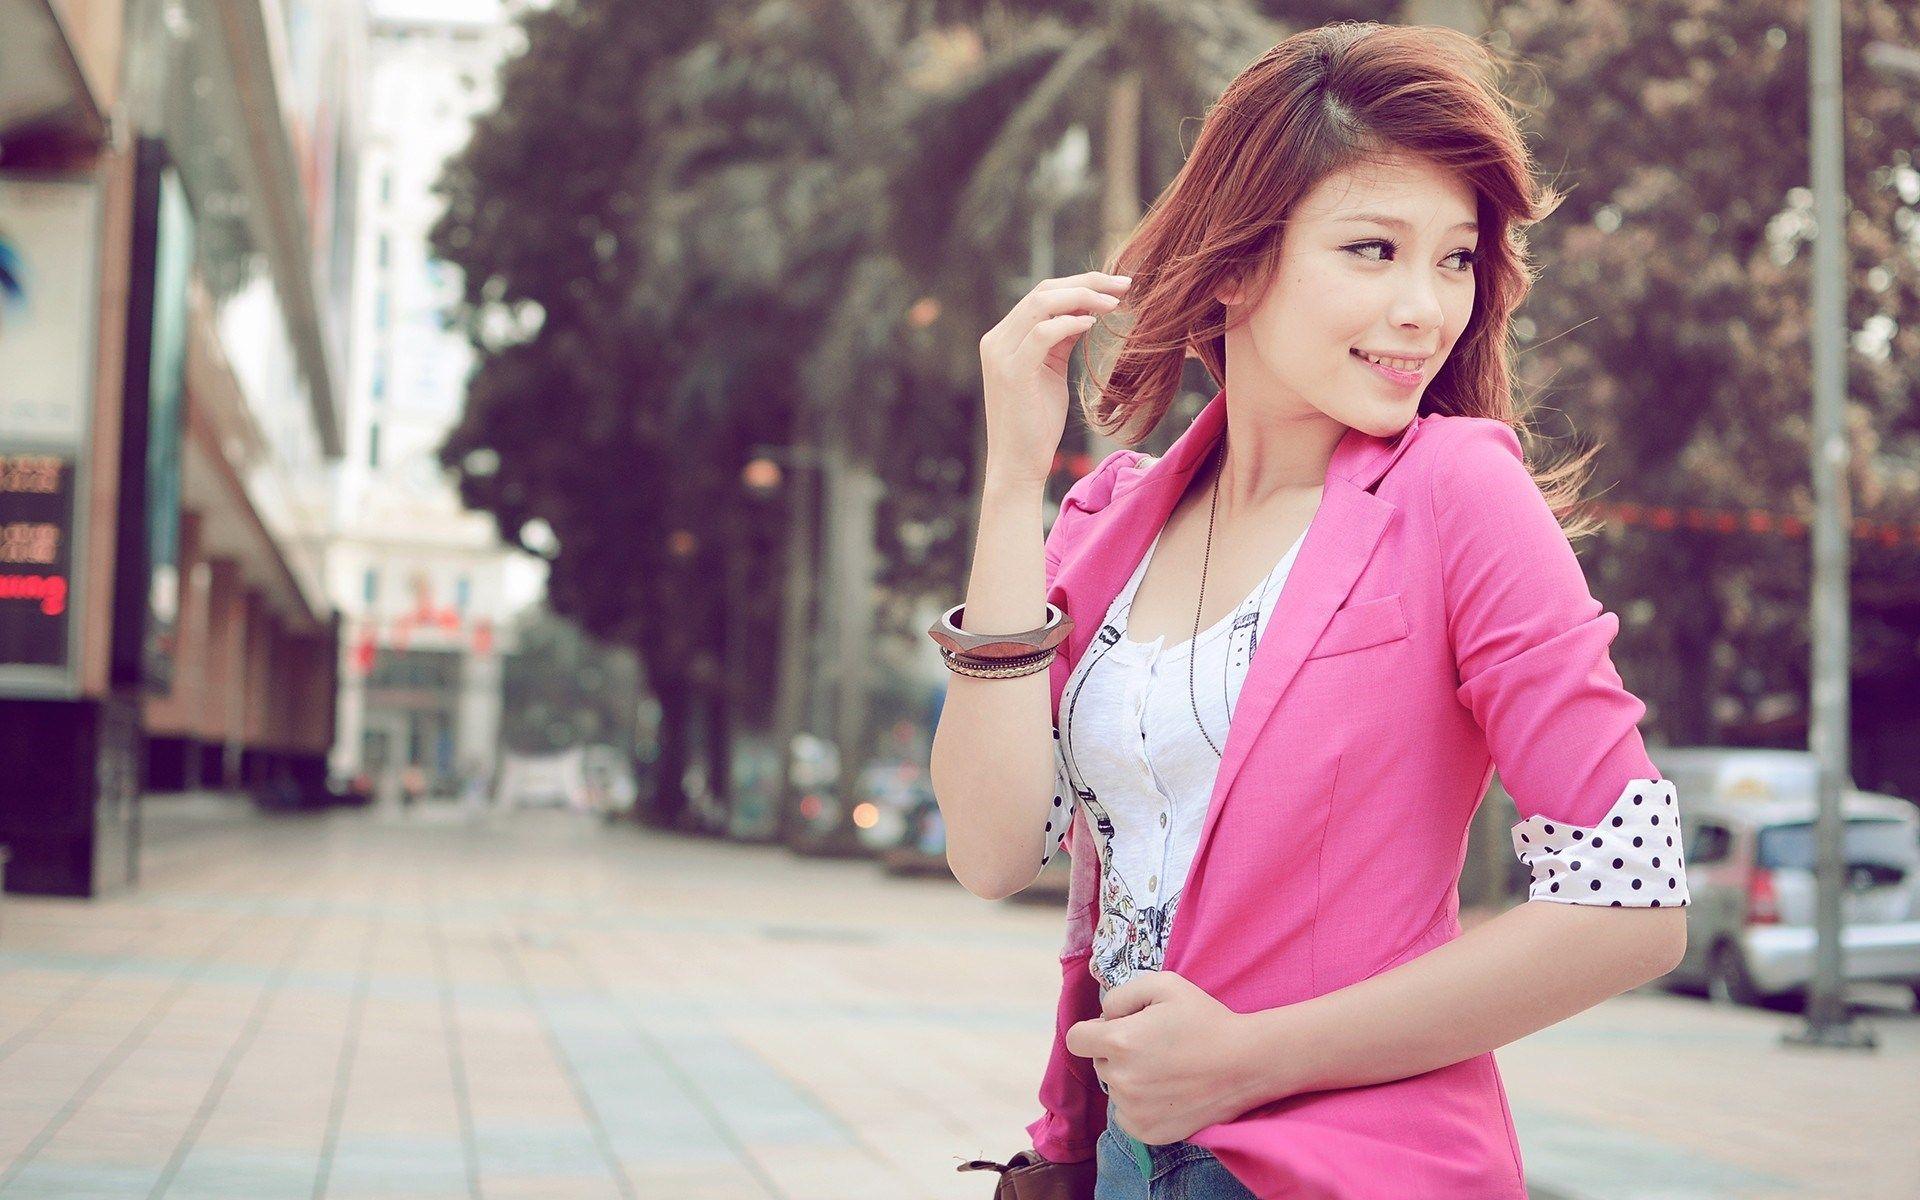 Korean Girls 1080p Wallpapers